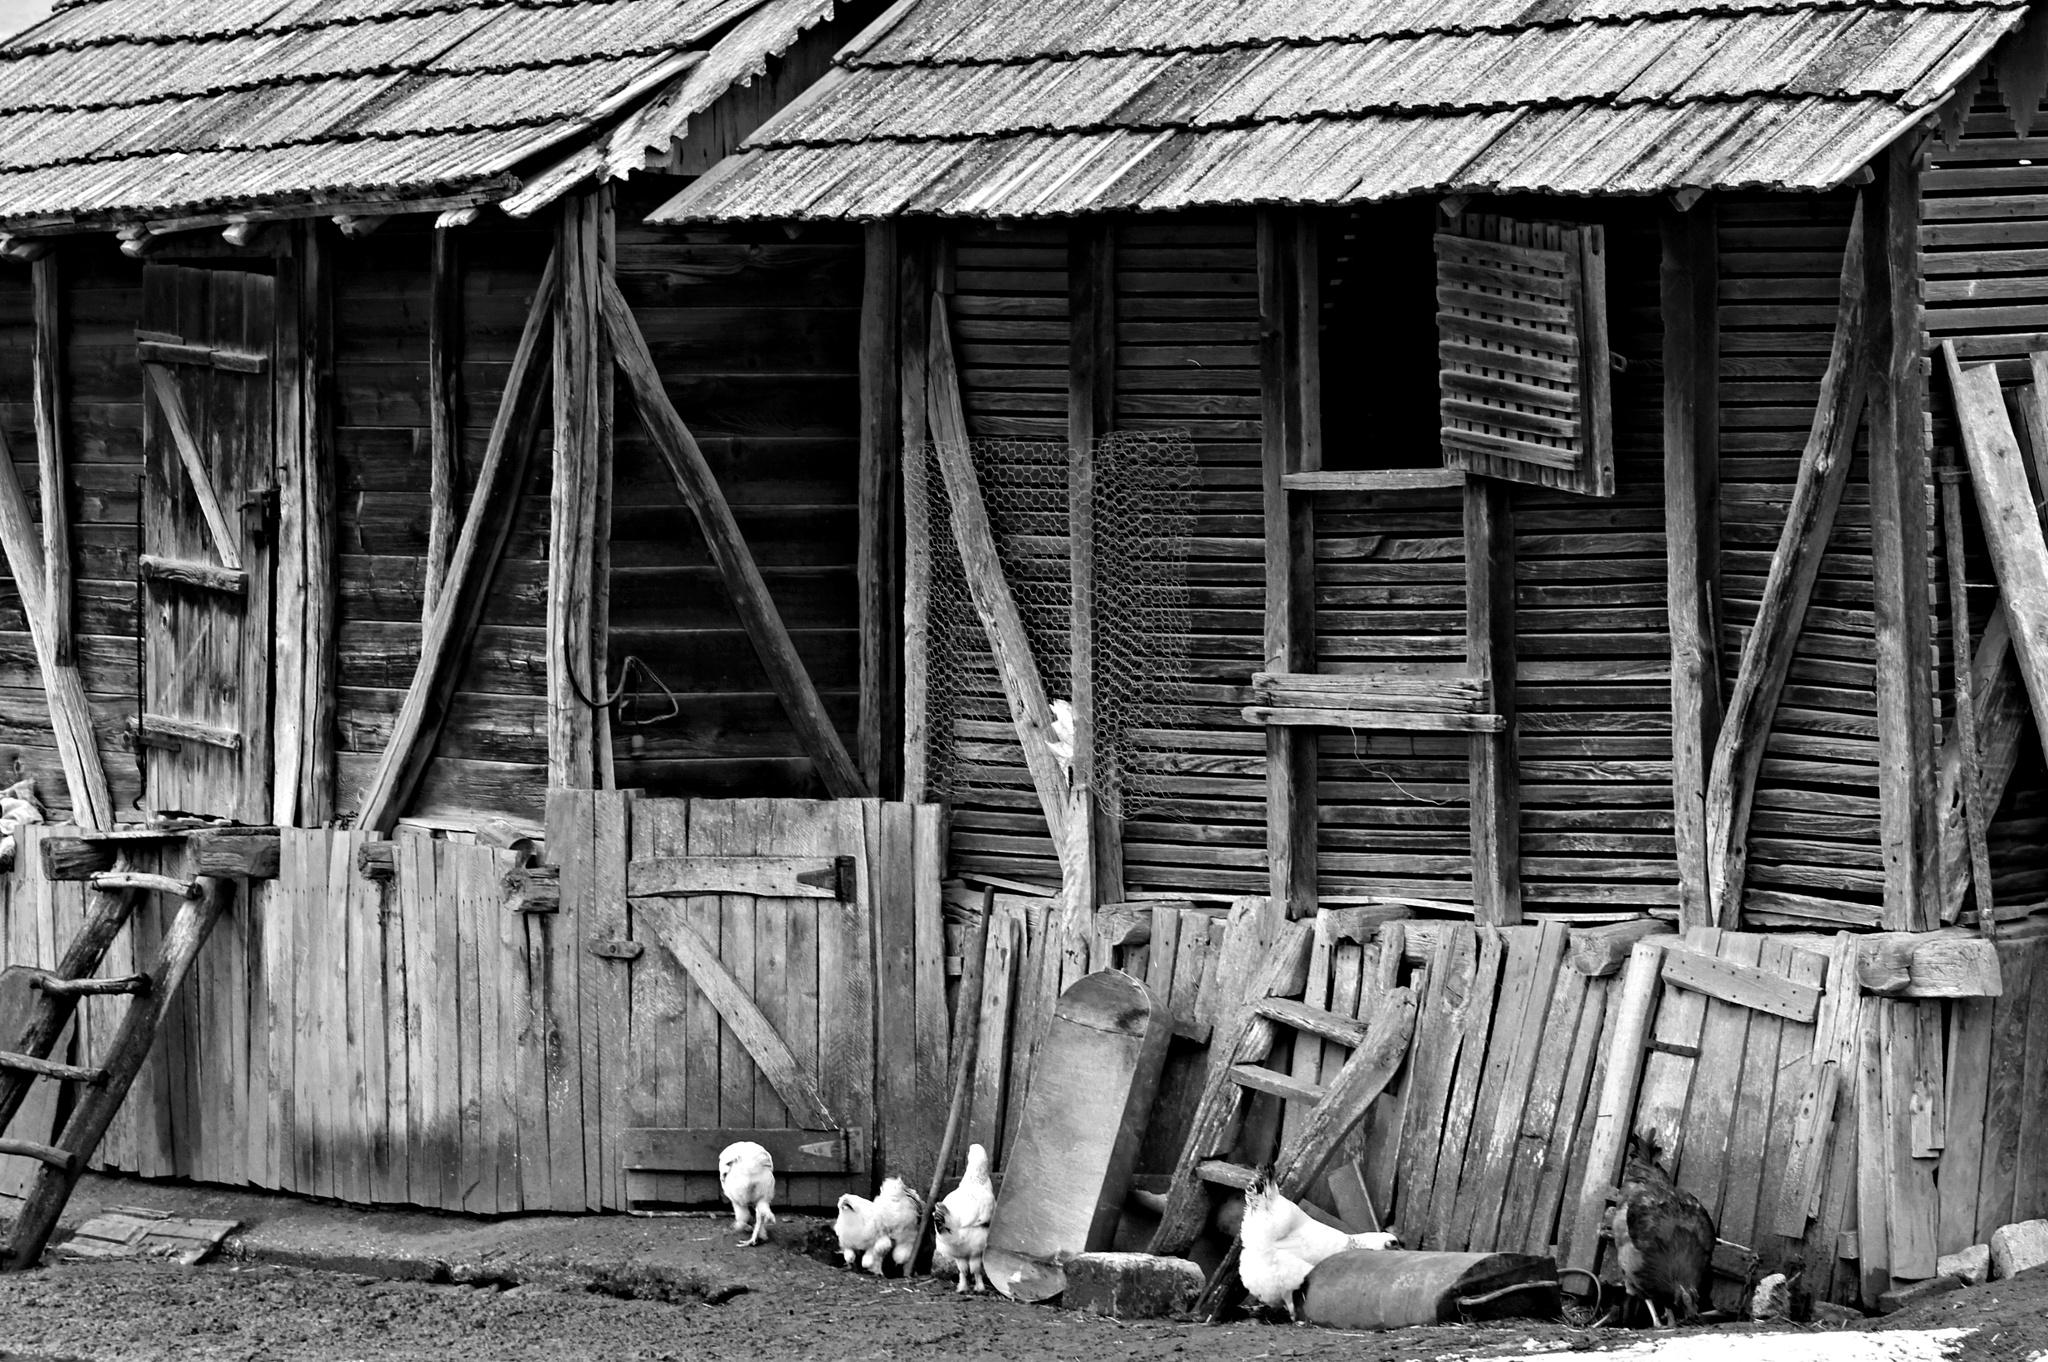 Home sweet home by alin.dijmarescu